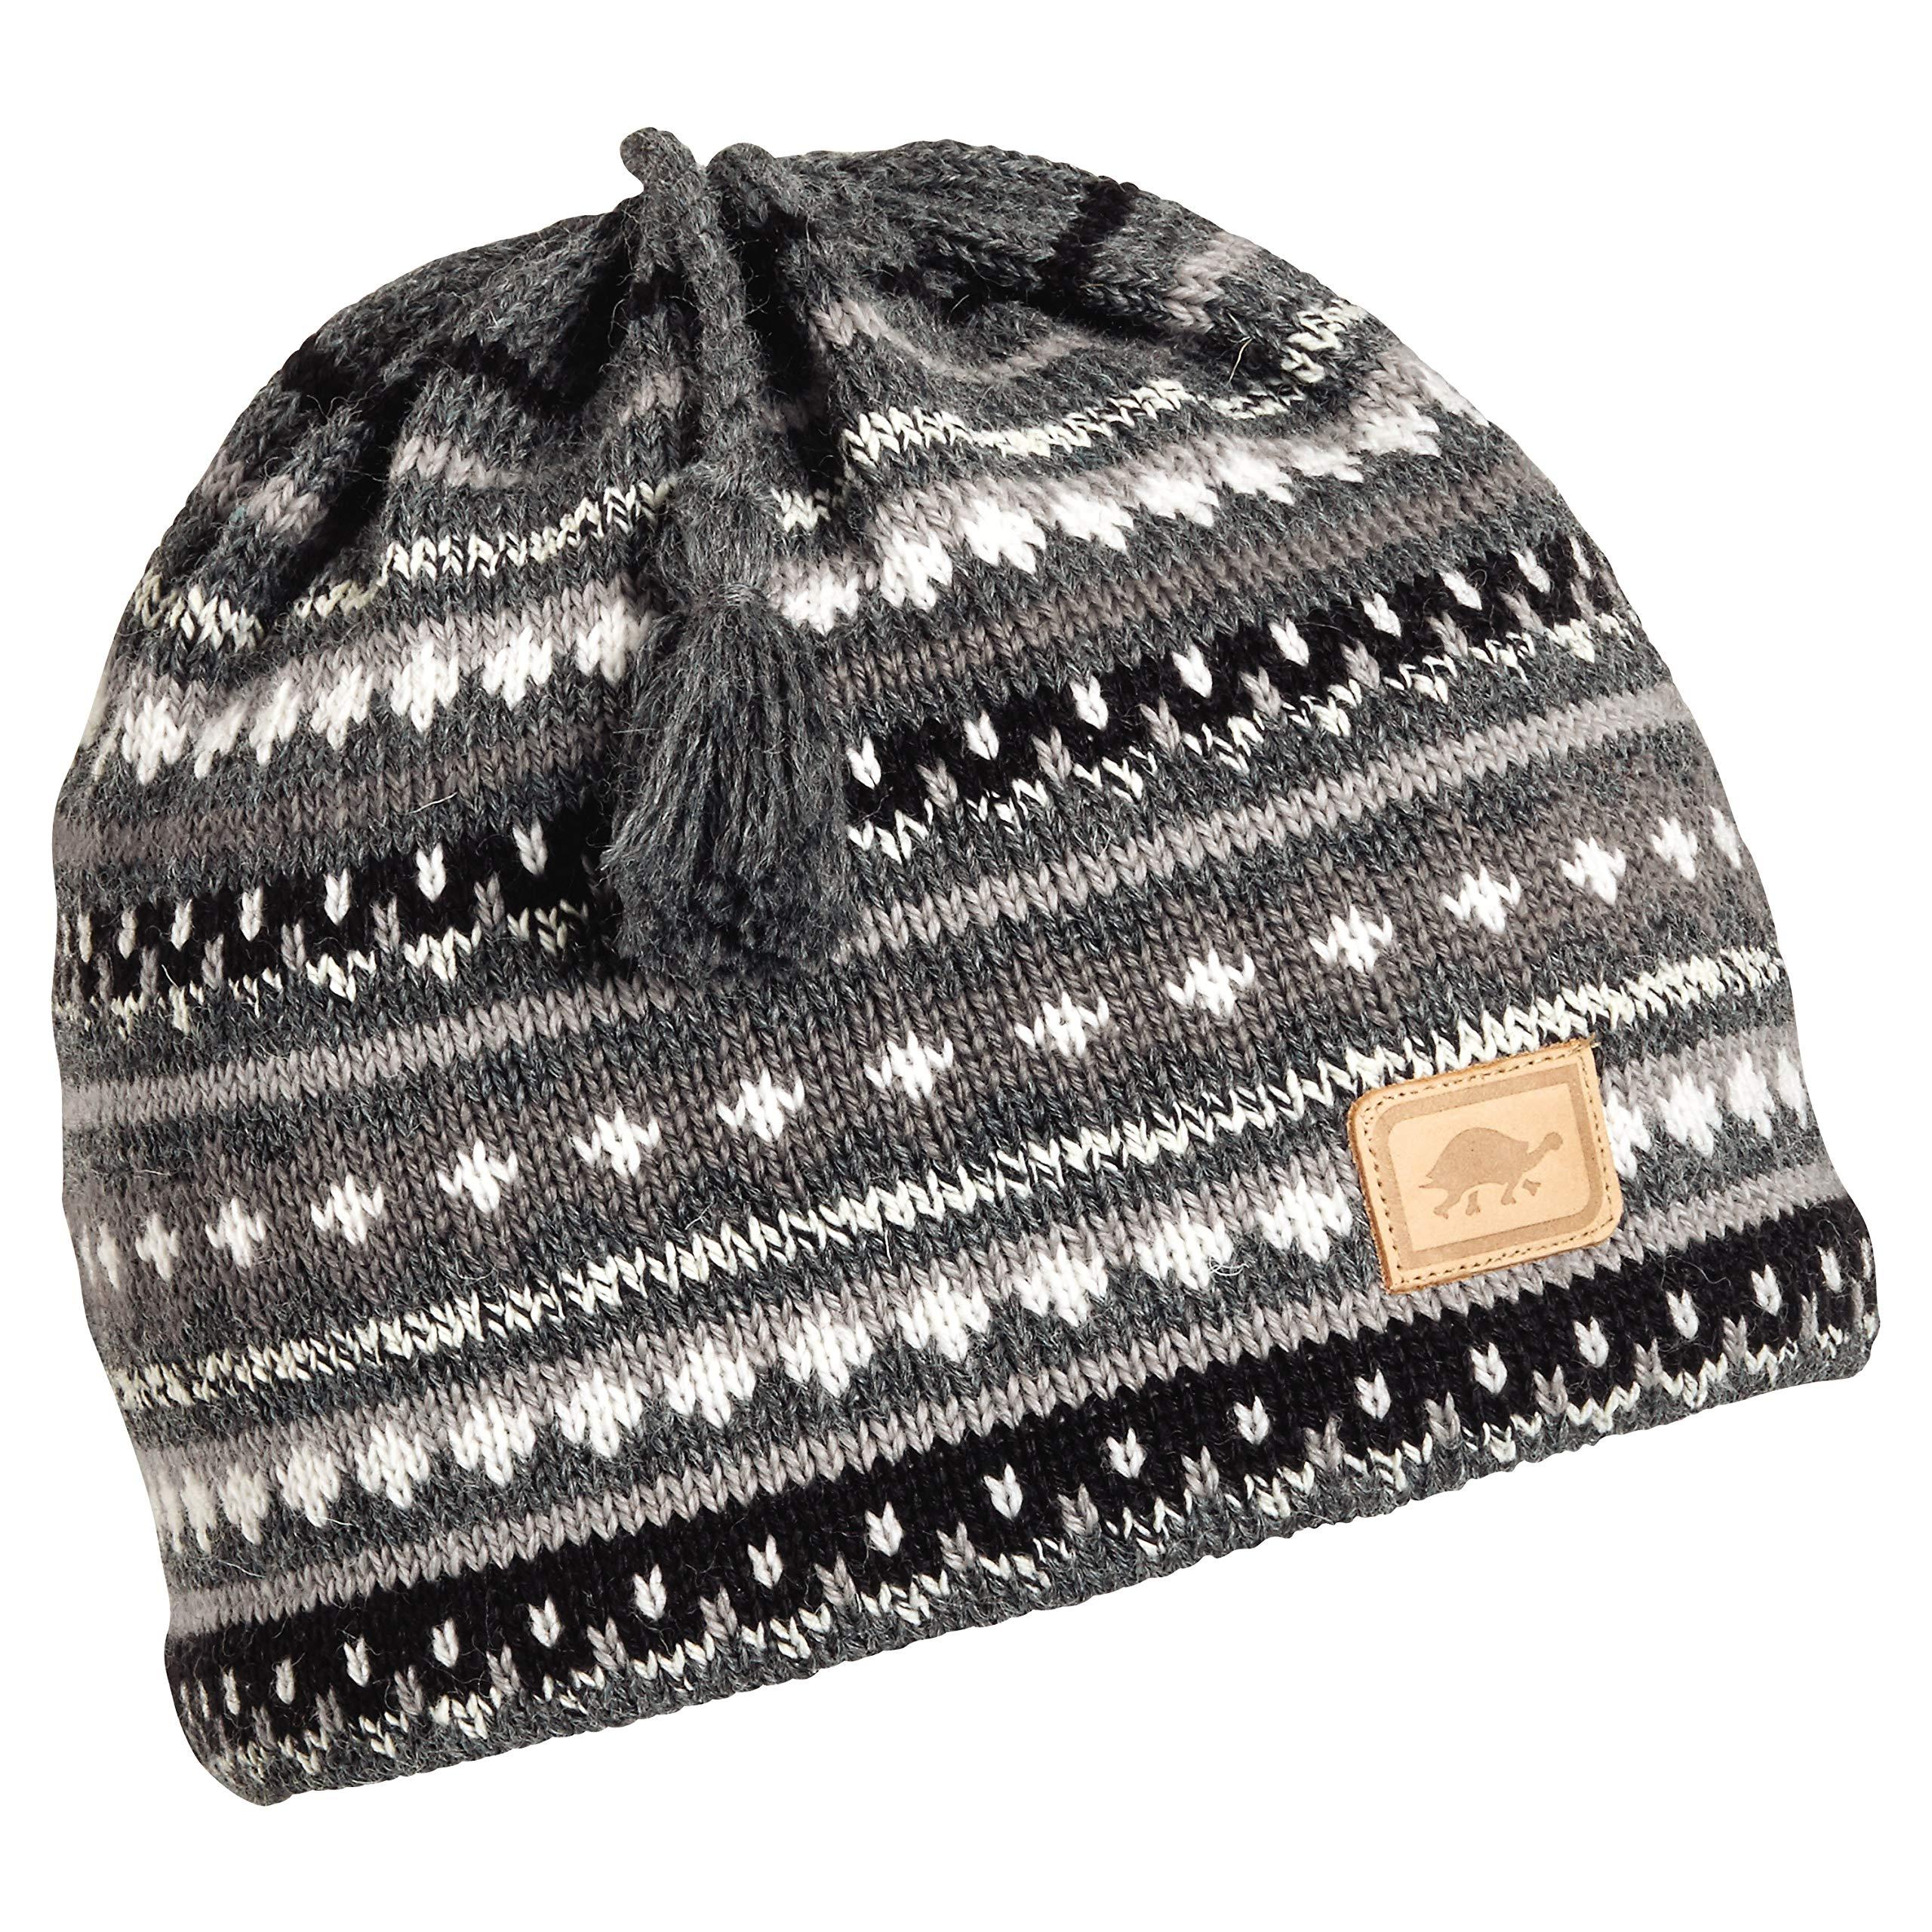 Turtle Fur S'More Women's Wool Knit Classic Ski Hat Tassel Beanie Charcoal Heather